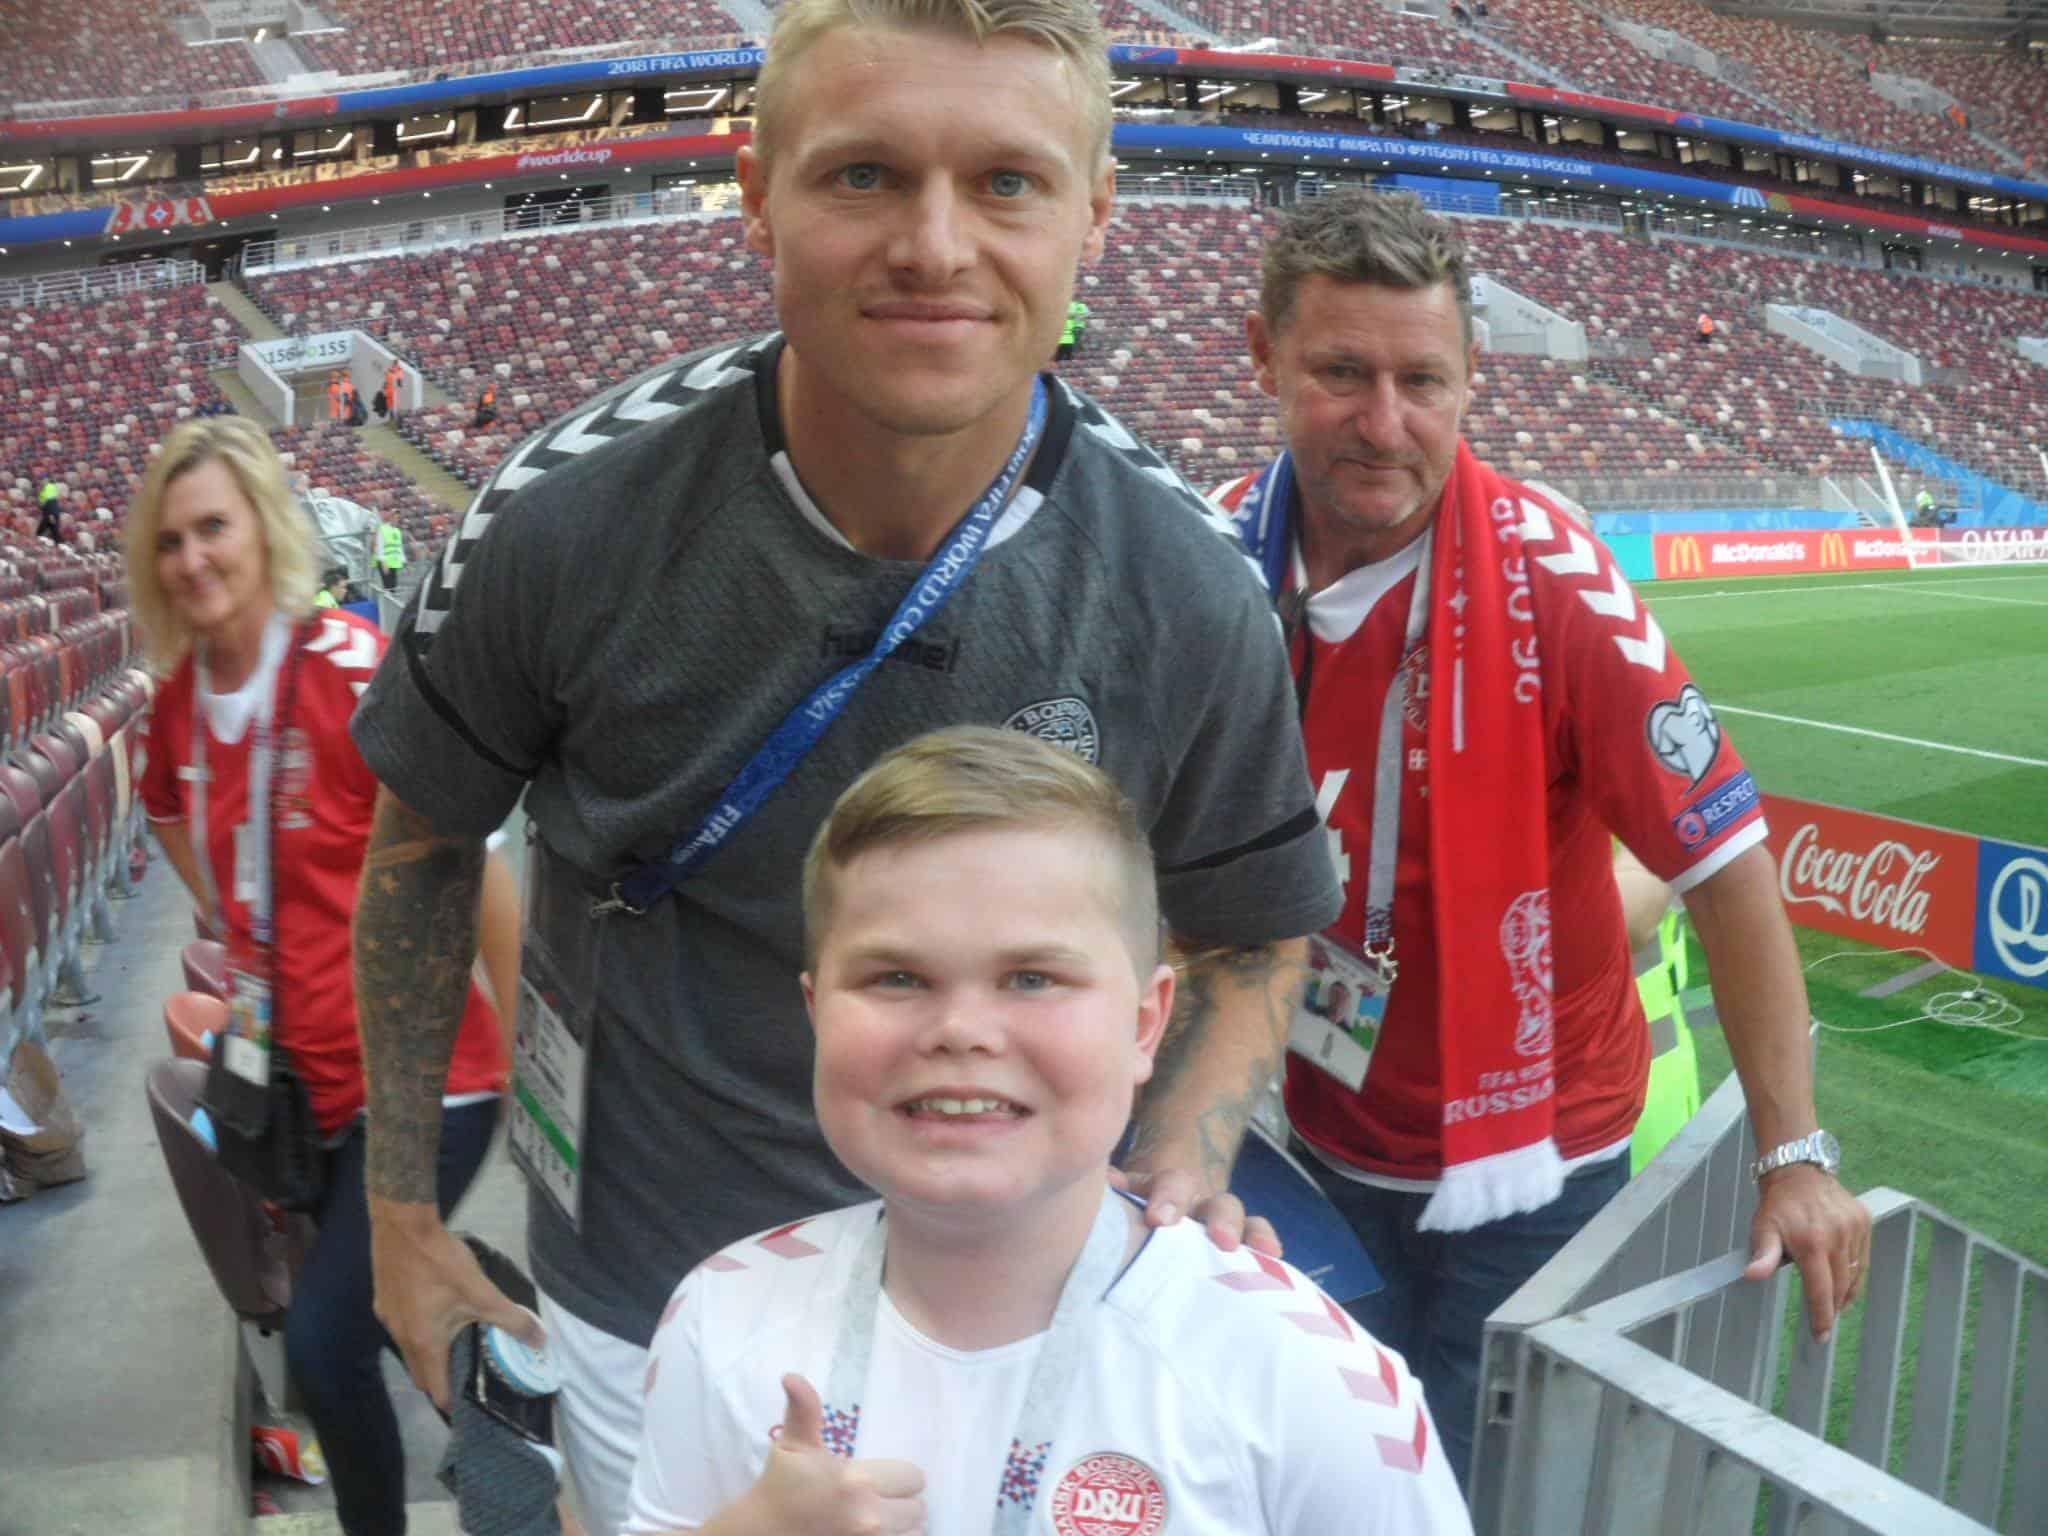 Husker du Ønskebarnet Andreas, fodboldentusiasten over dem alle?